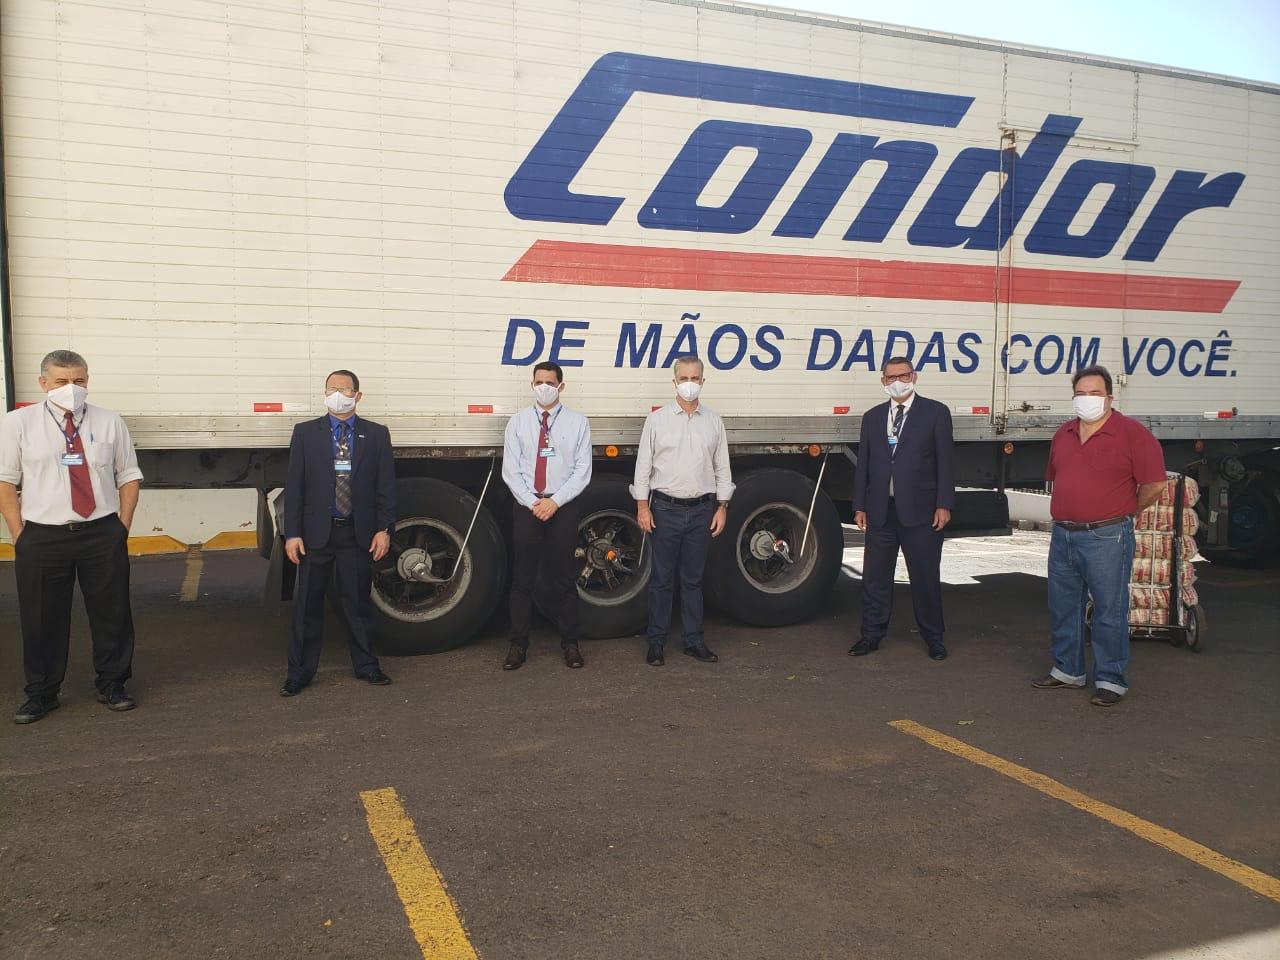 Condor doa quase 10 toneladas de alimentos para Maringá